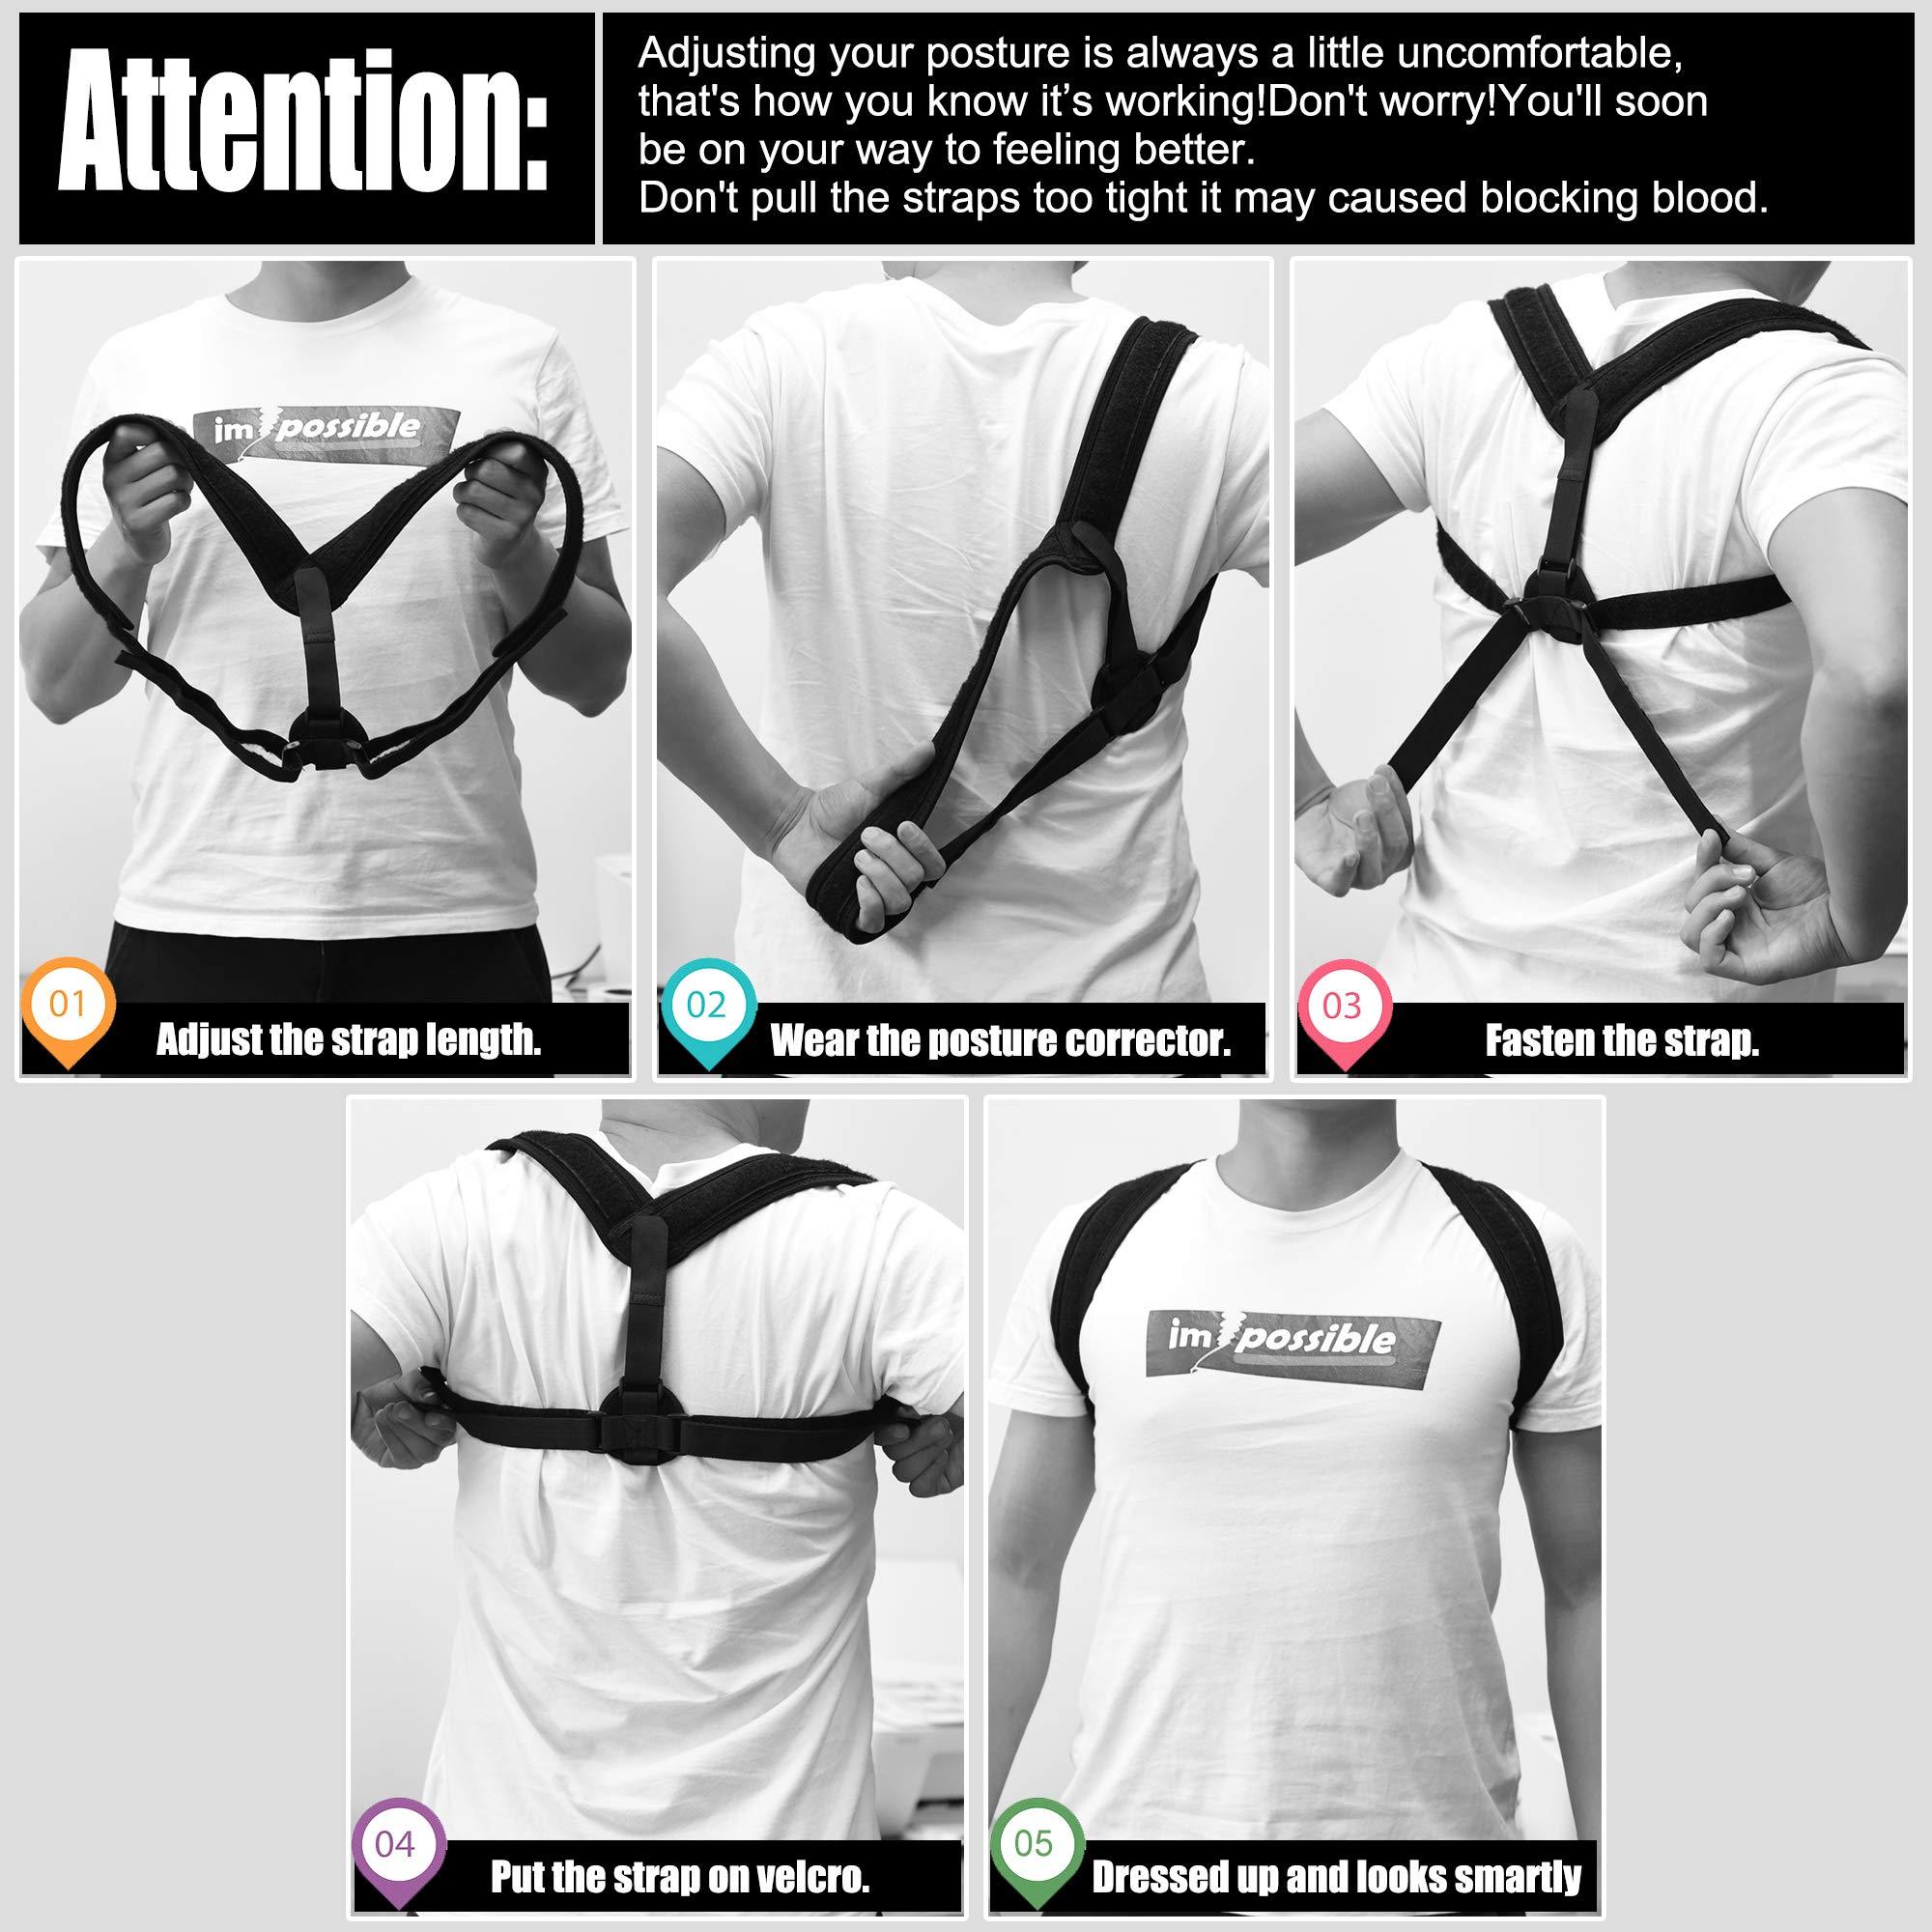 Back Support Posture Corrector for Women and Men,Adjustable Posture Corrector Back Brace Support Belt Lumbar Waist Shoulder Corset Spine Support Posture Correction (Normal)